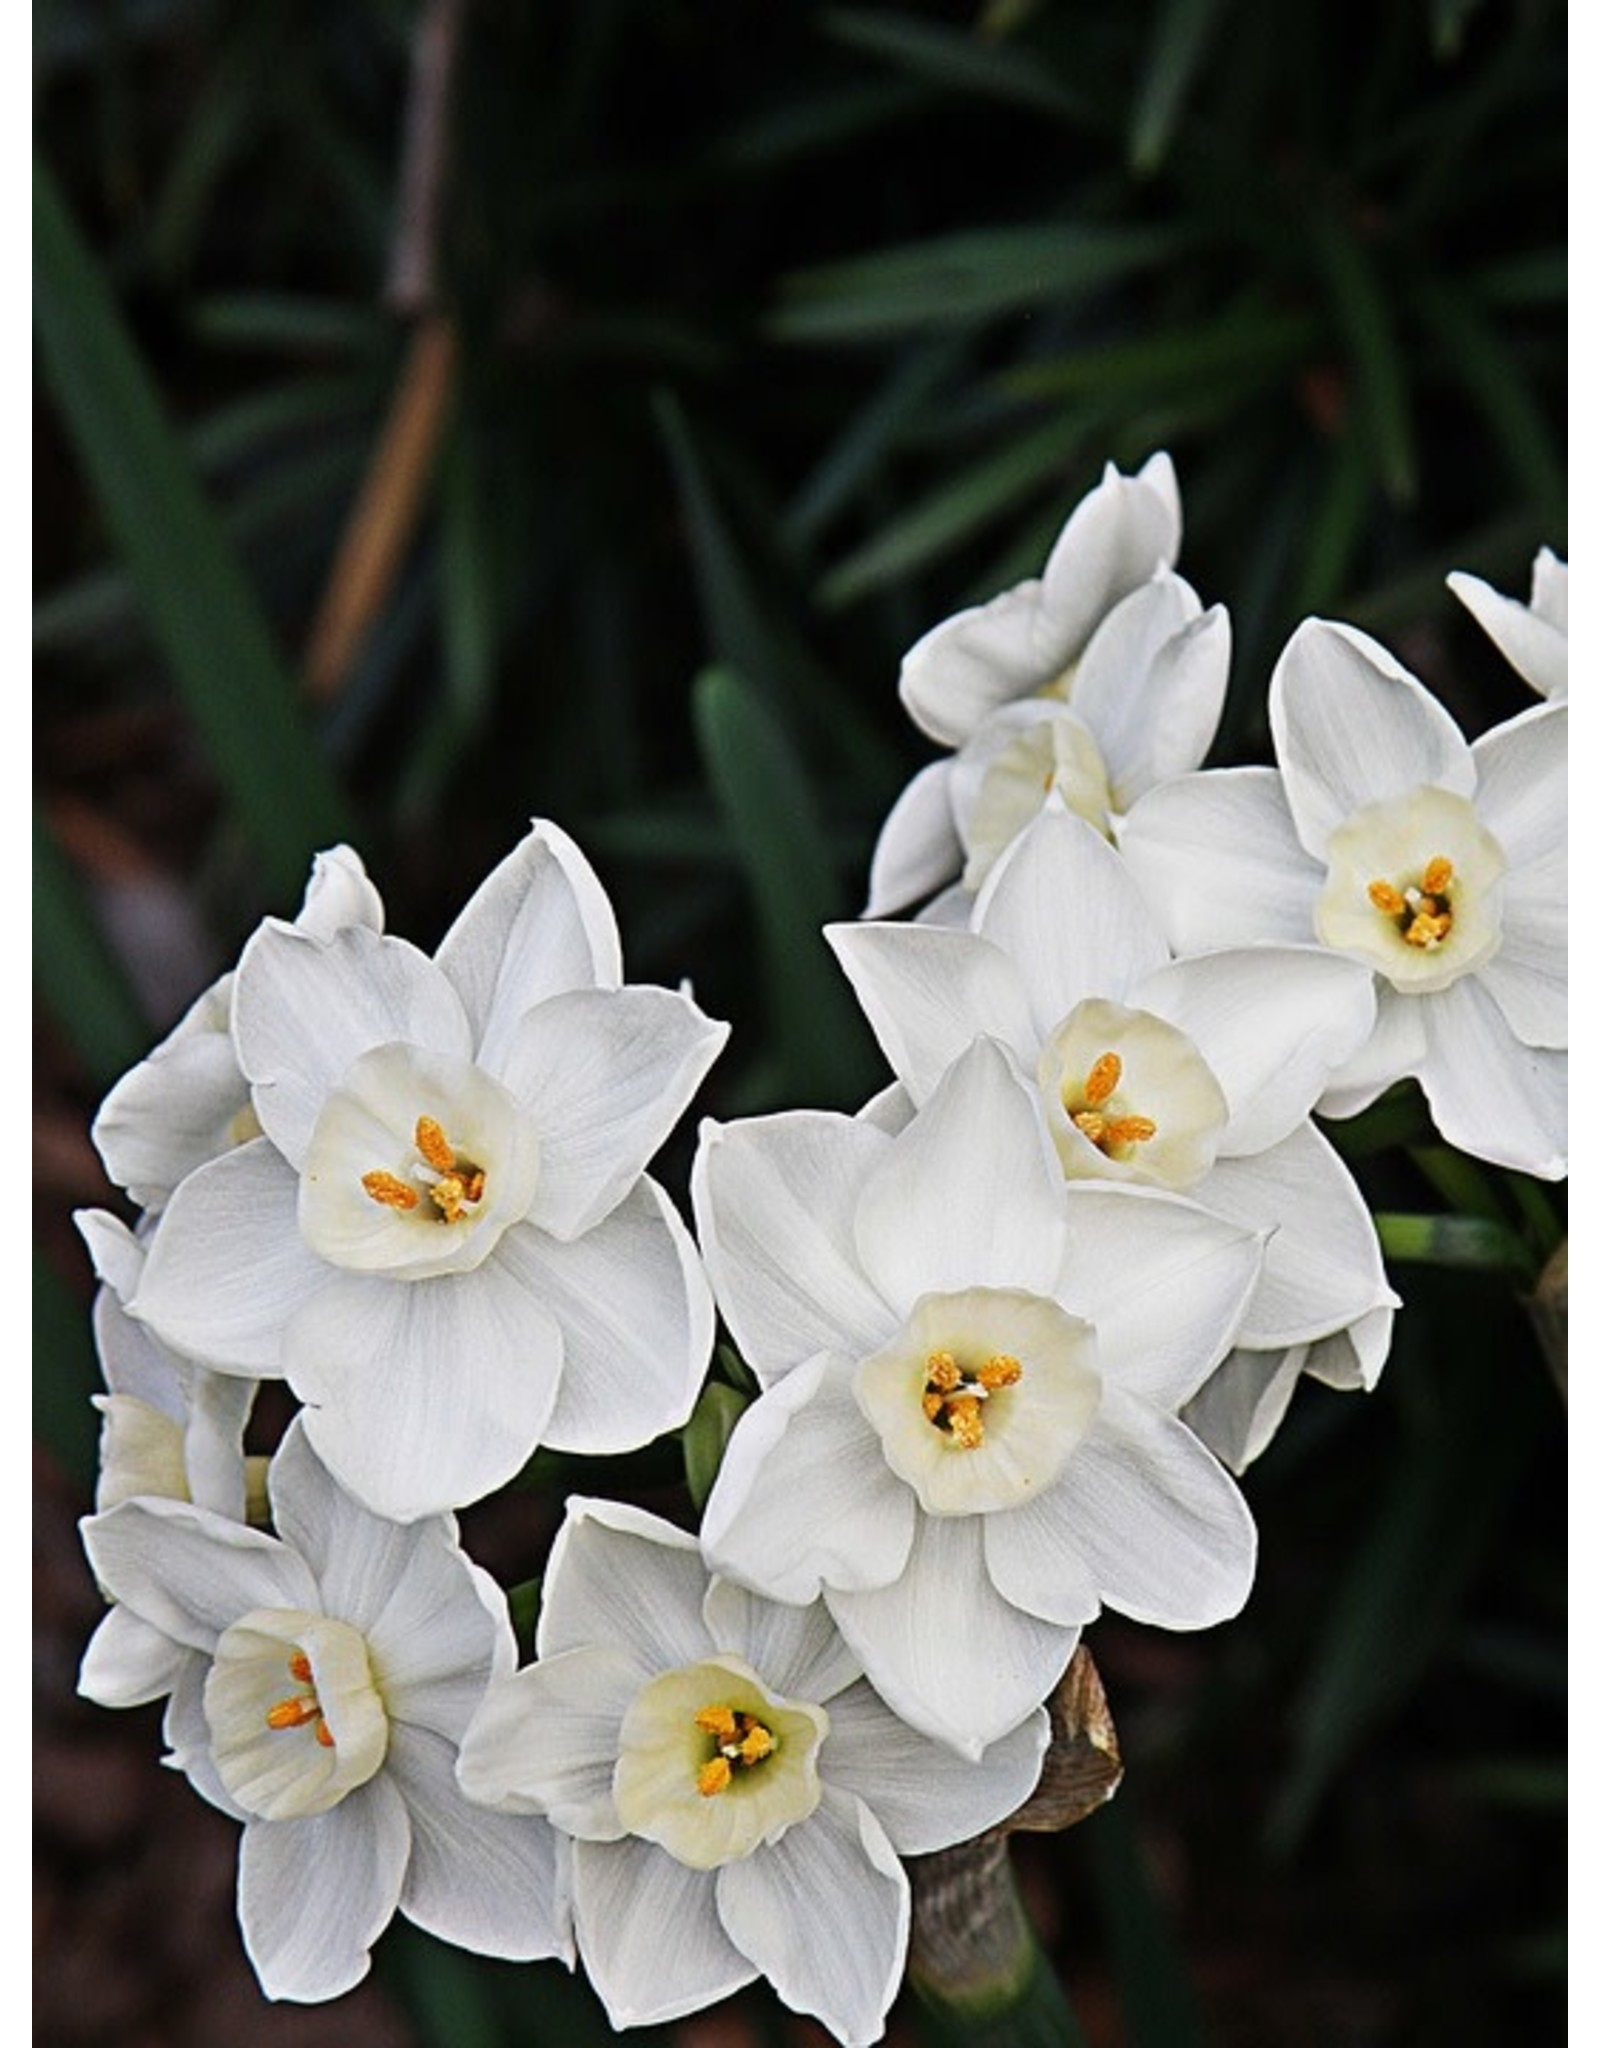 Bulb - Paperwhite Ziva (Single Bulb) - Paper White